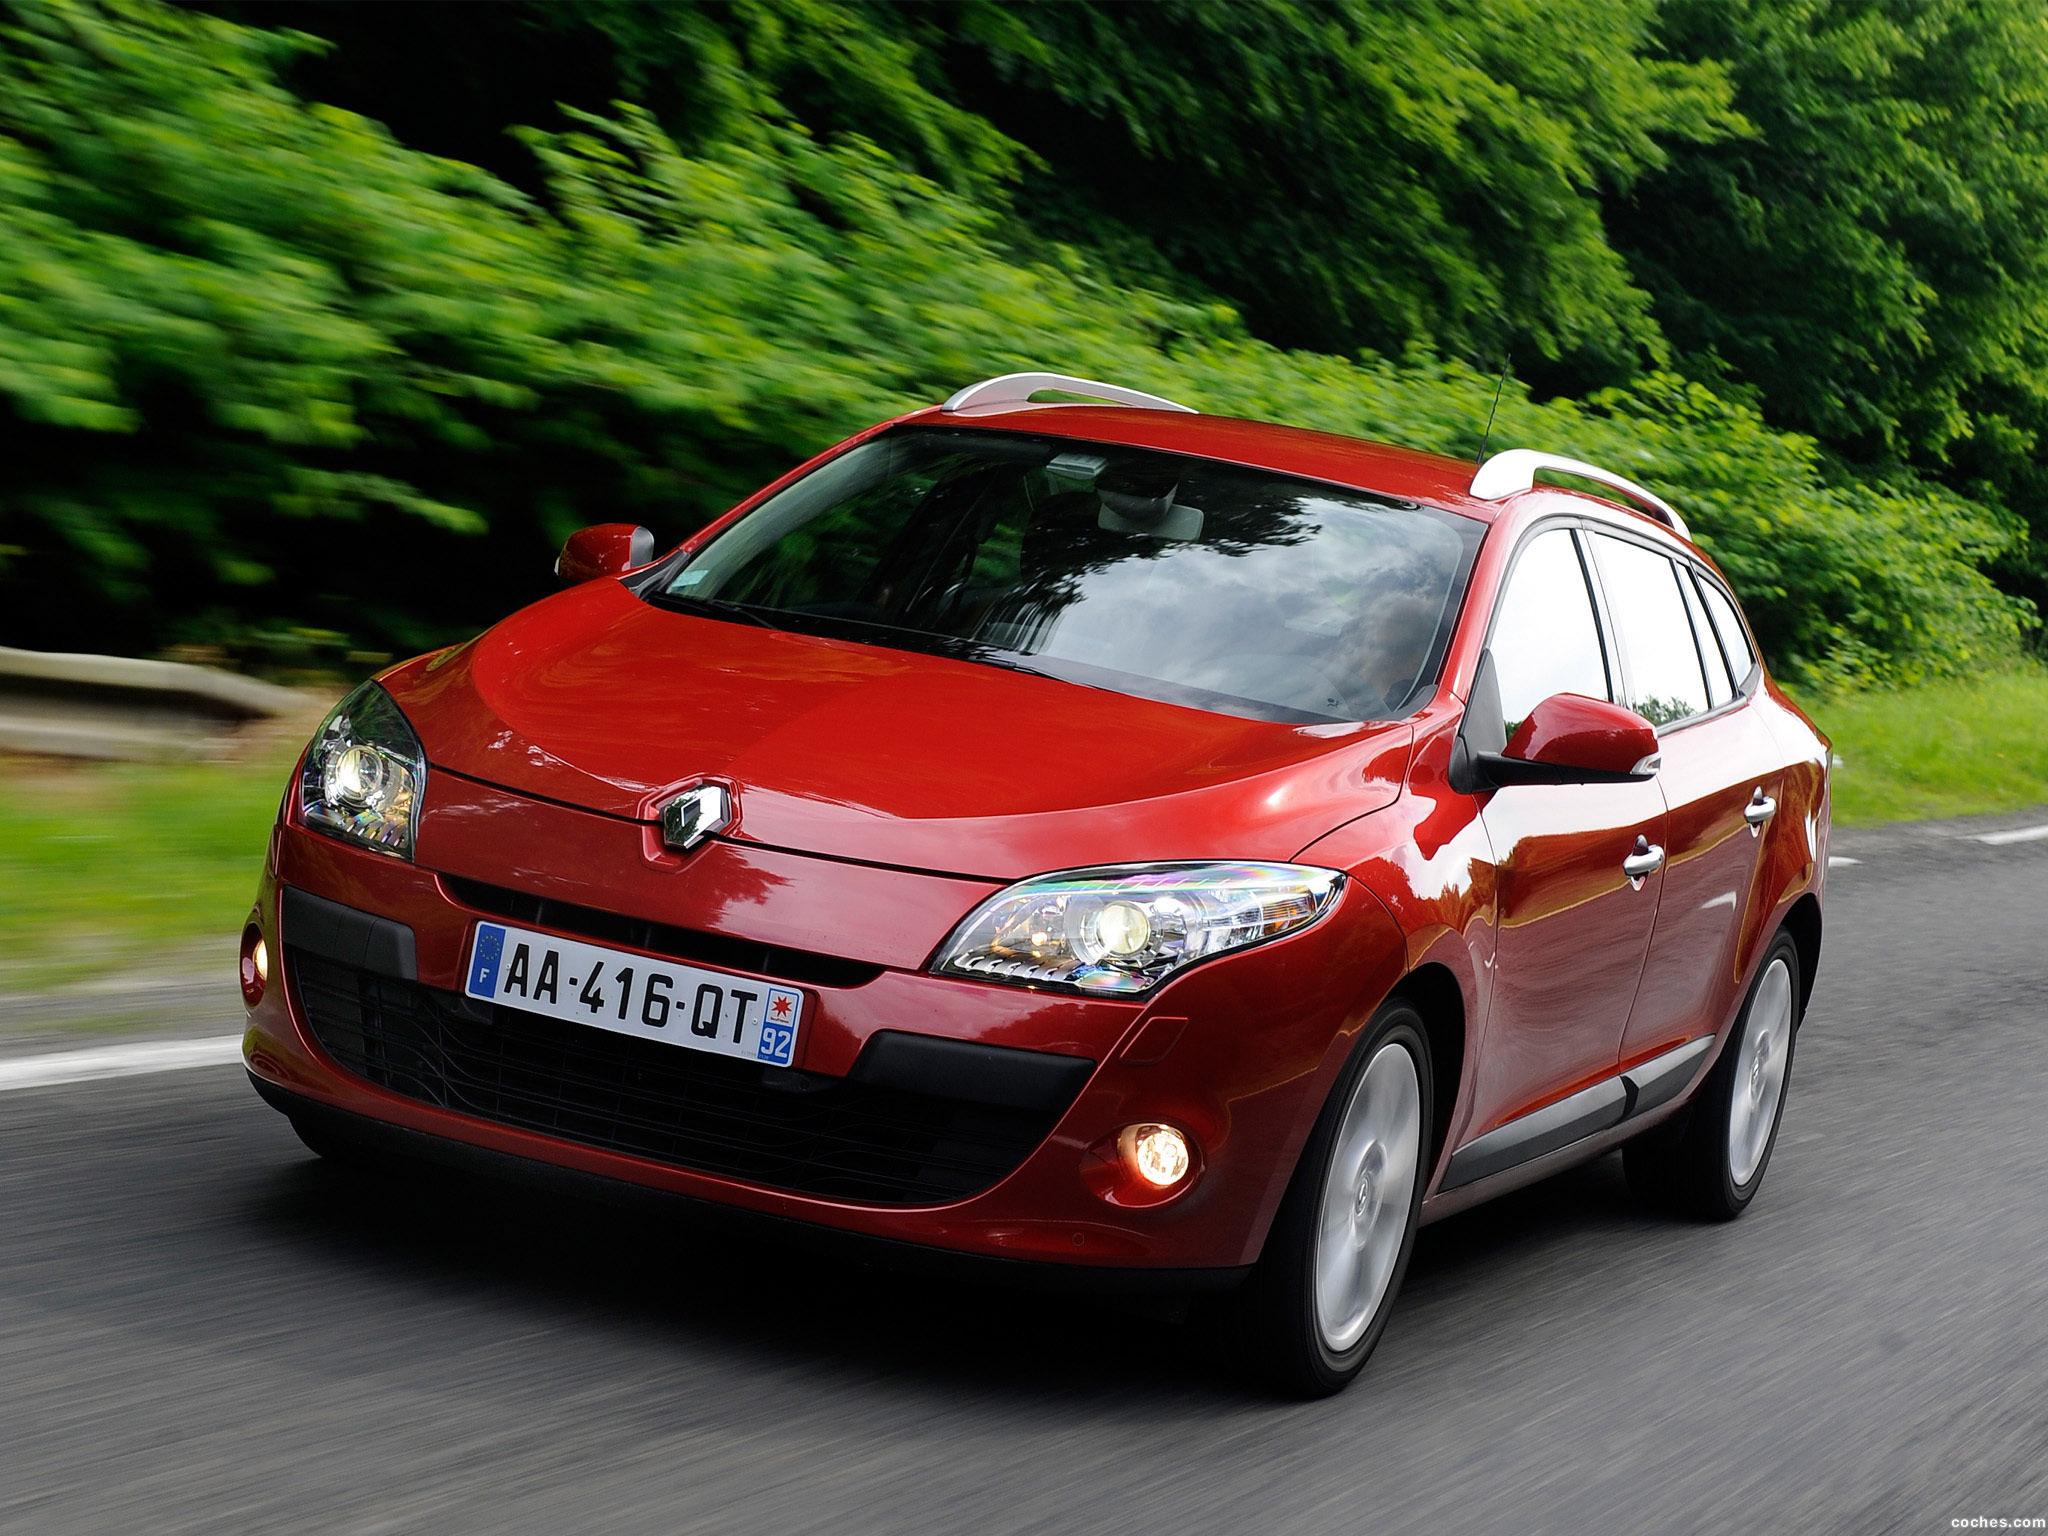 Foto 2 de Renault Megane Sports Tourer 2009